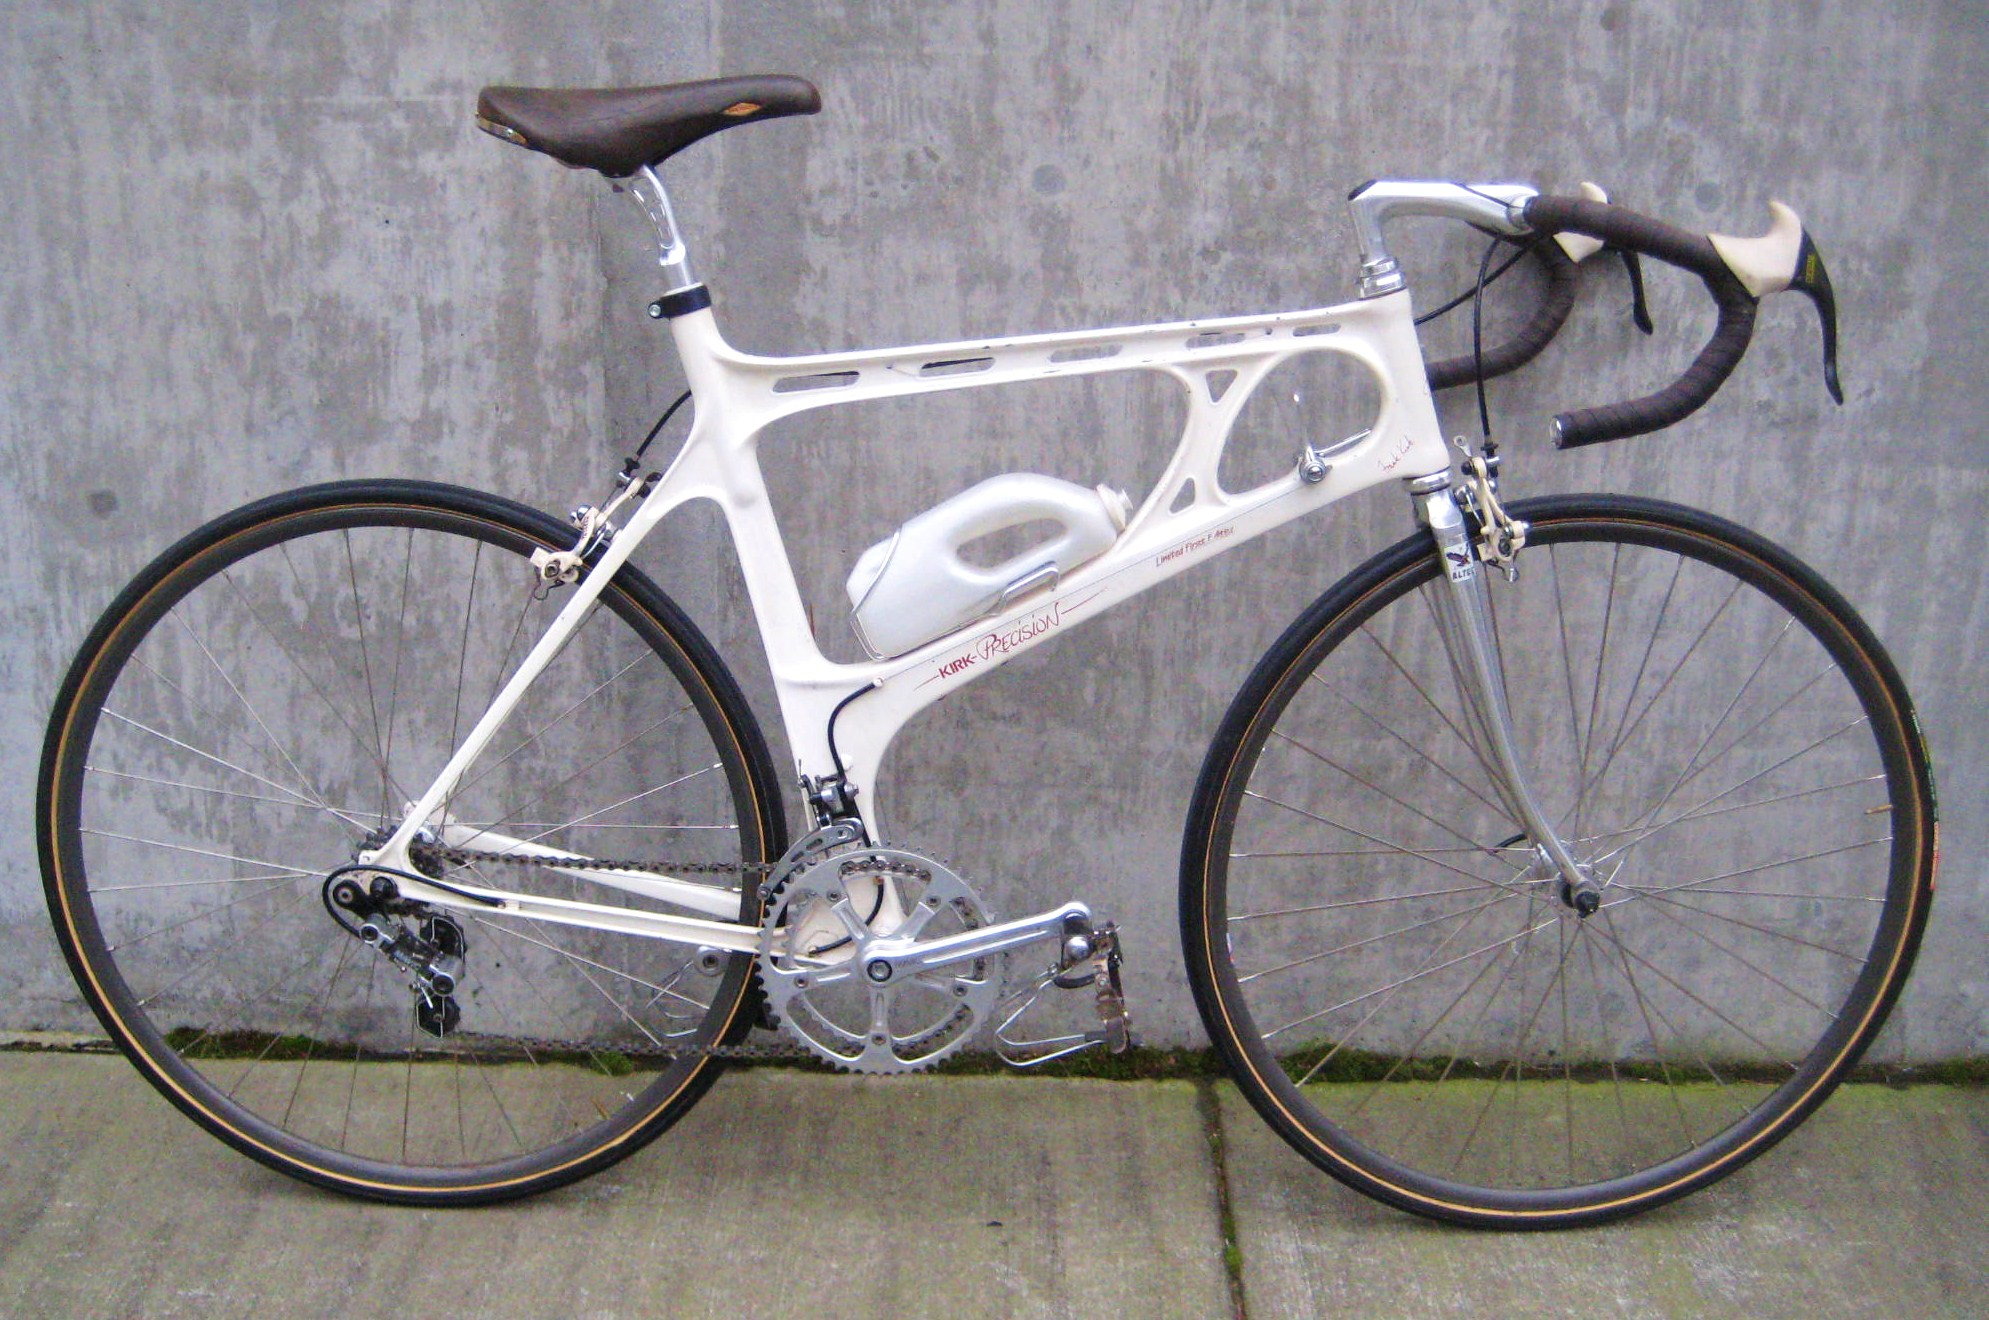 1987 Kirk precision magnesium road bike | Classic Cycle Bainbridge ...